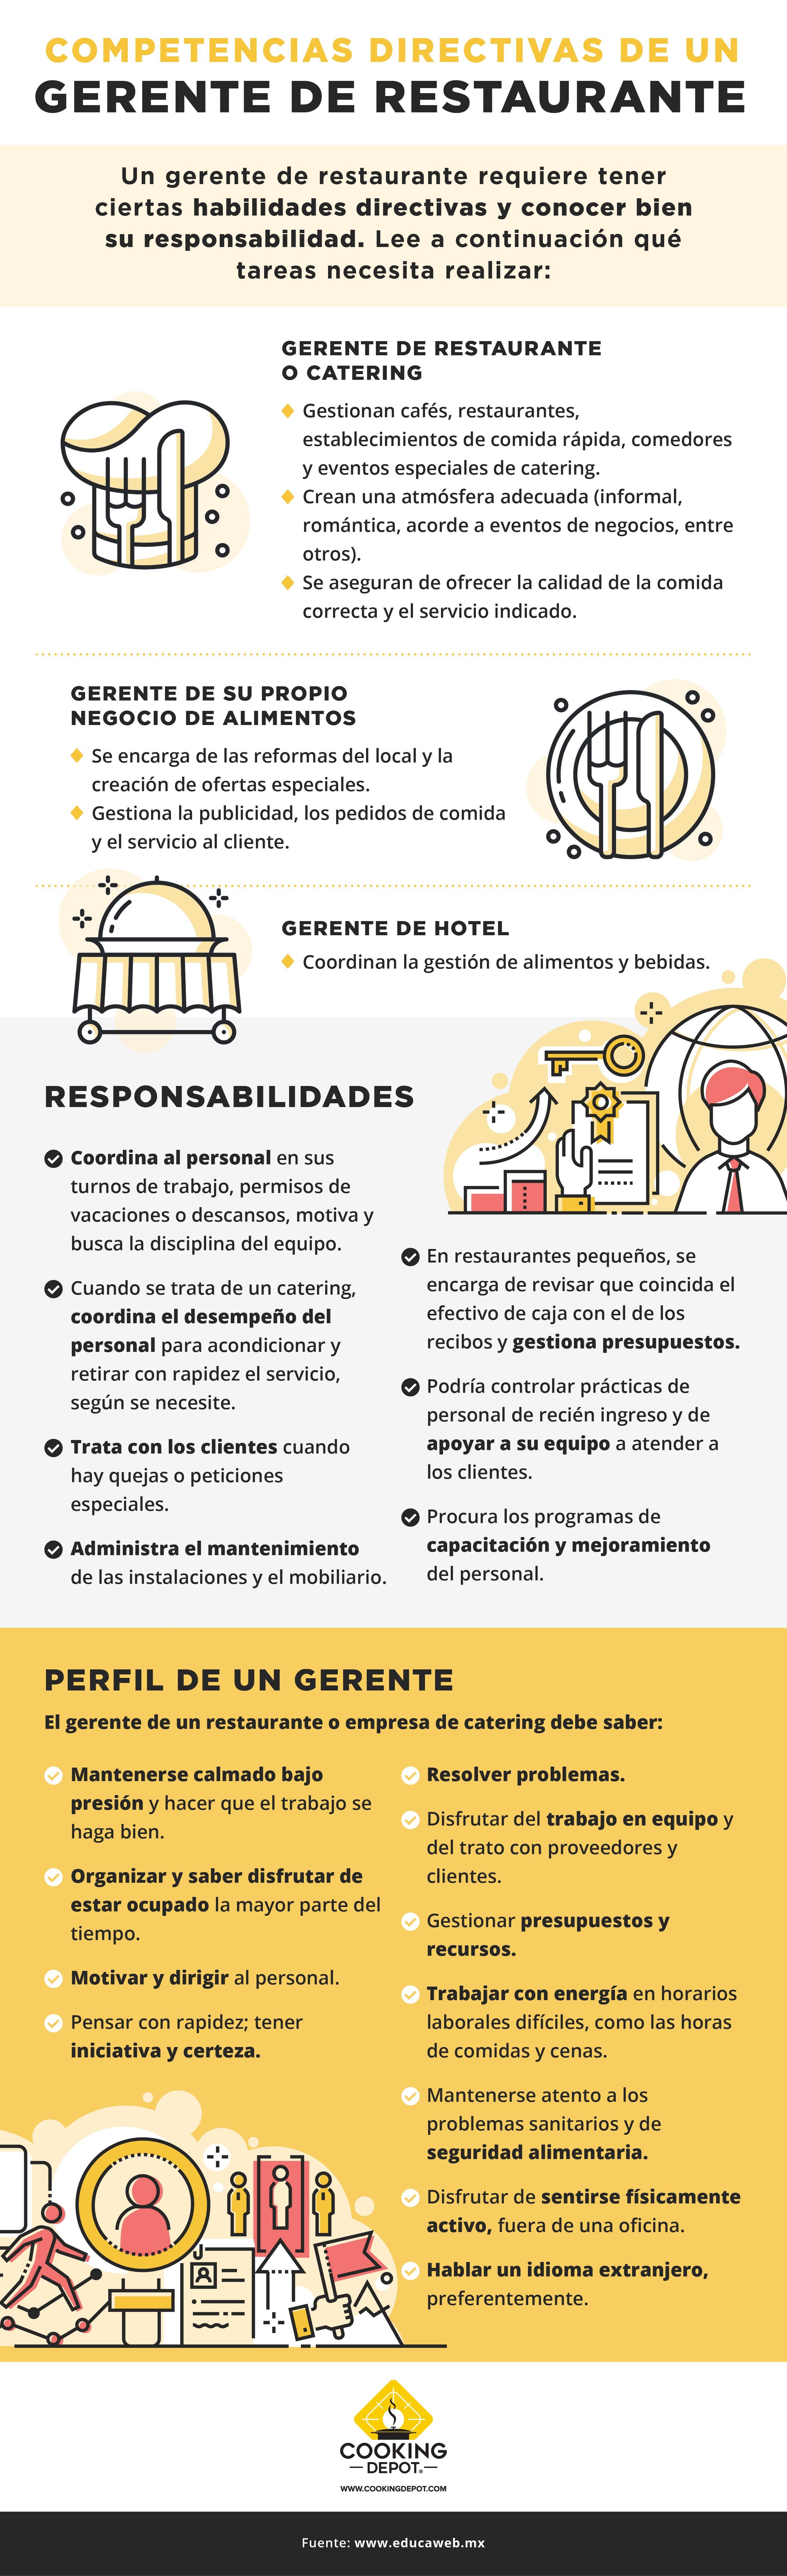 CD-S26-B1-Competencias directivas-Infografía